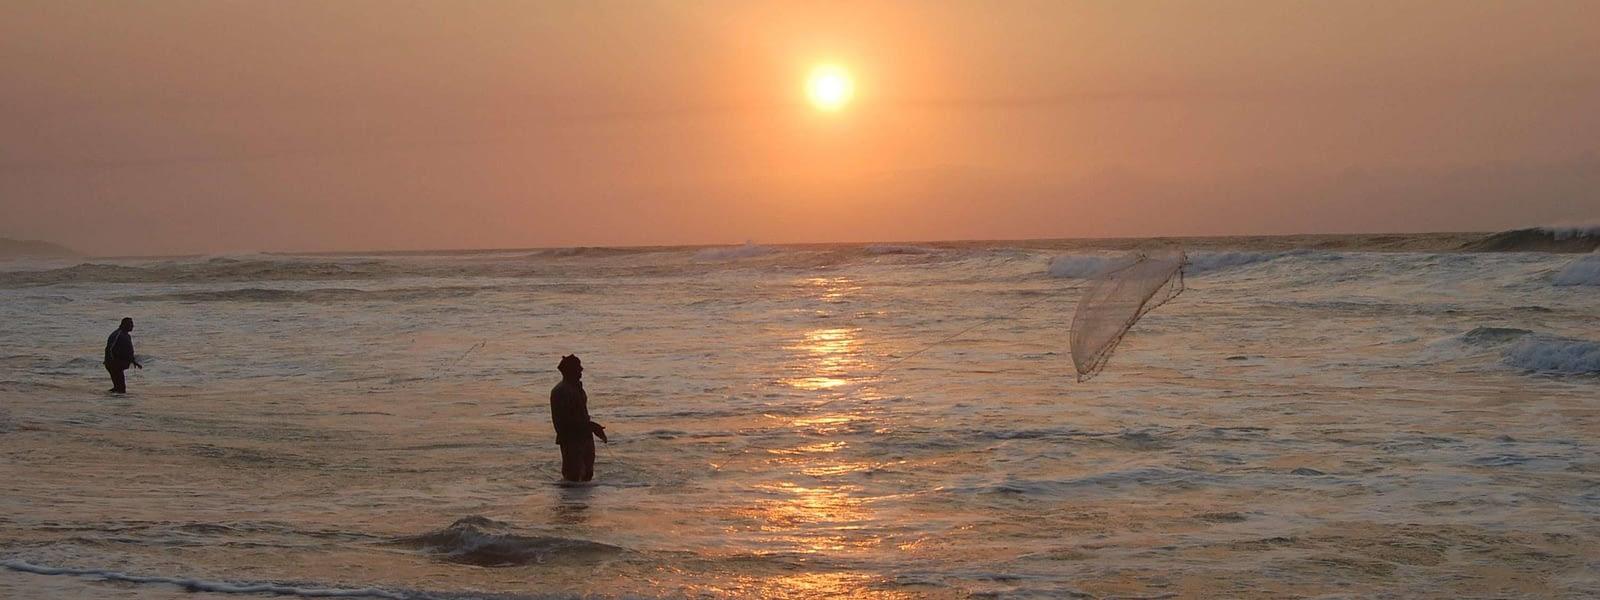 cast net fishing zinkwazi beach south africa